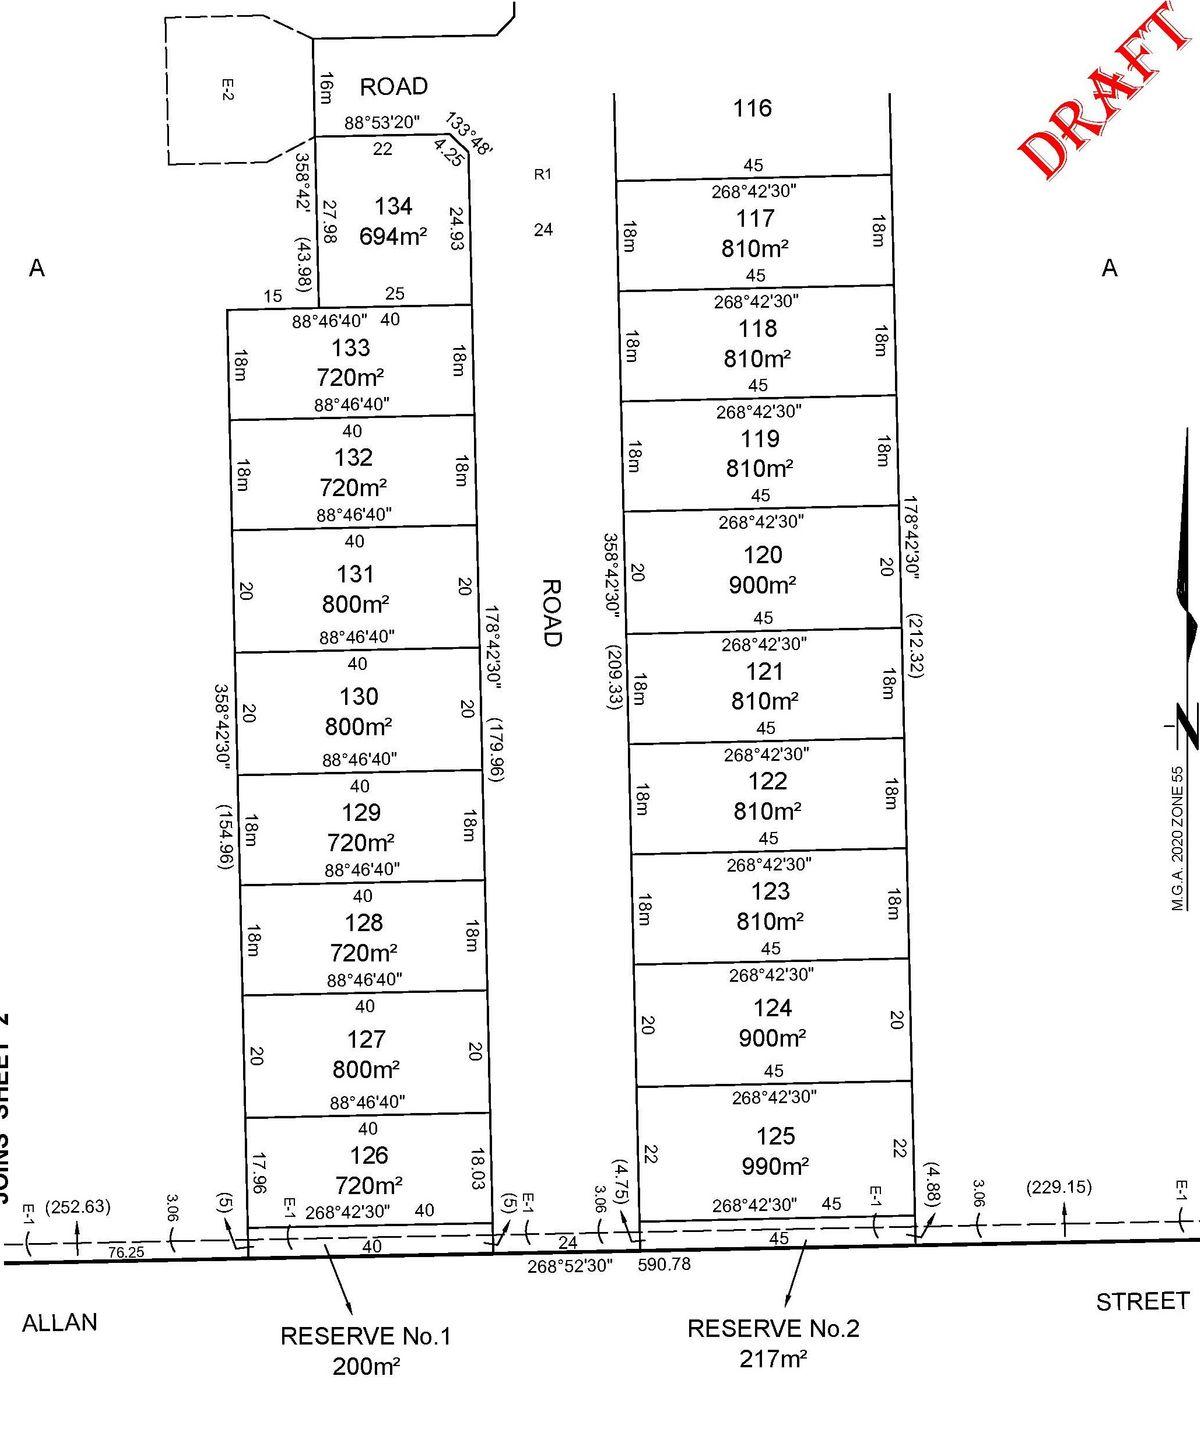 441 Allan Street, Kyabram, VIC 3620